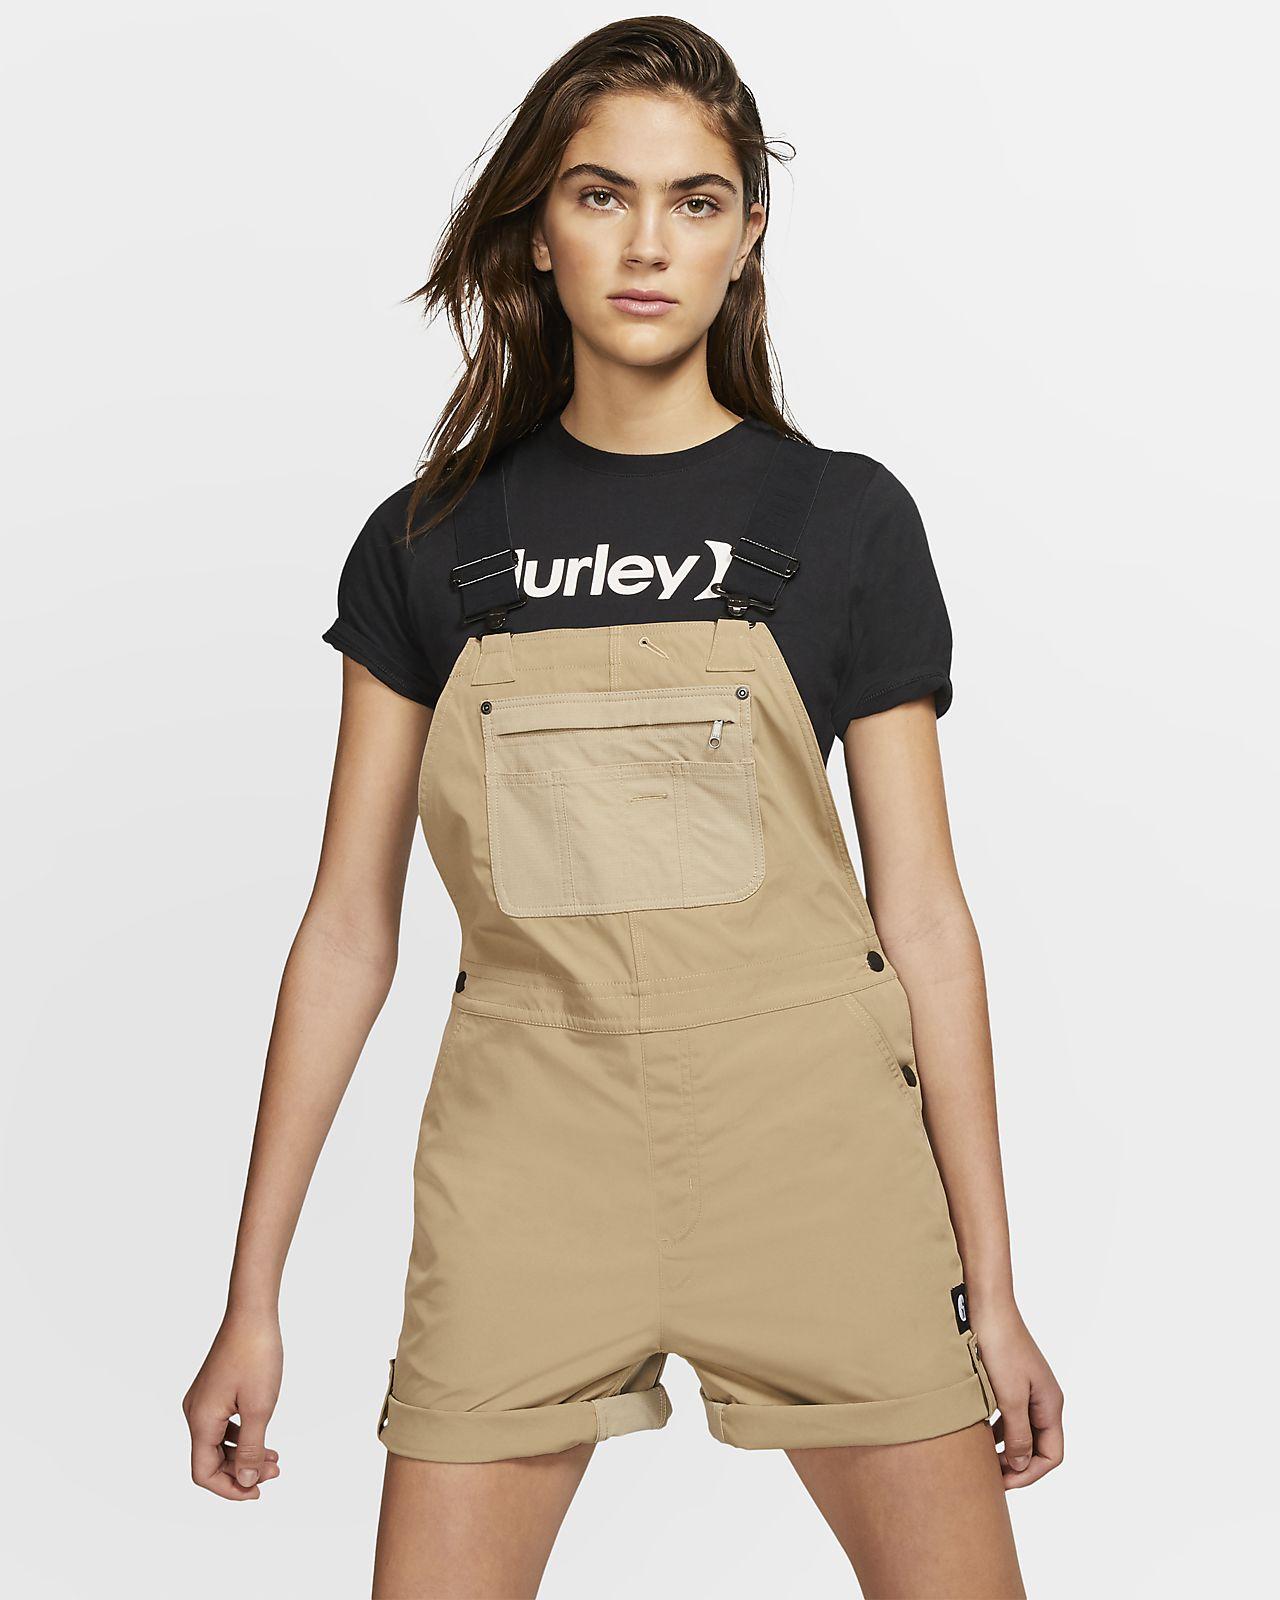 Hurley x Carhartt Granota - Dona